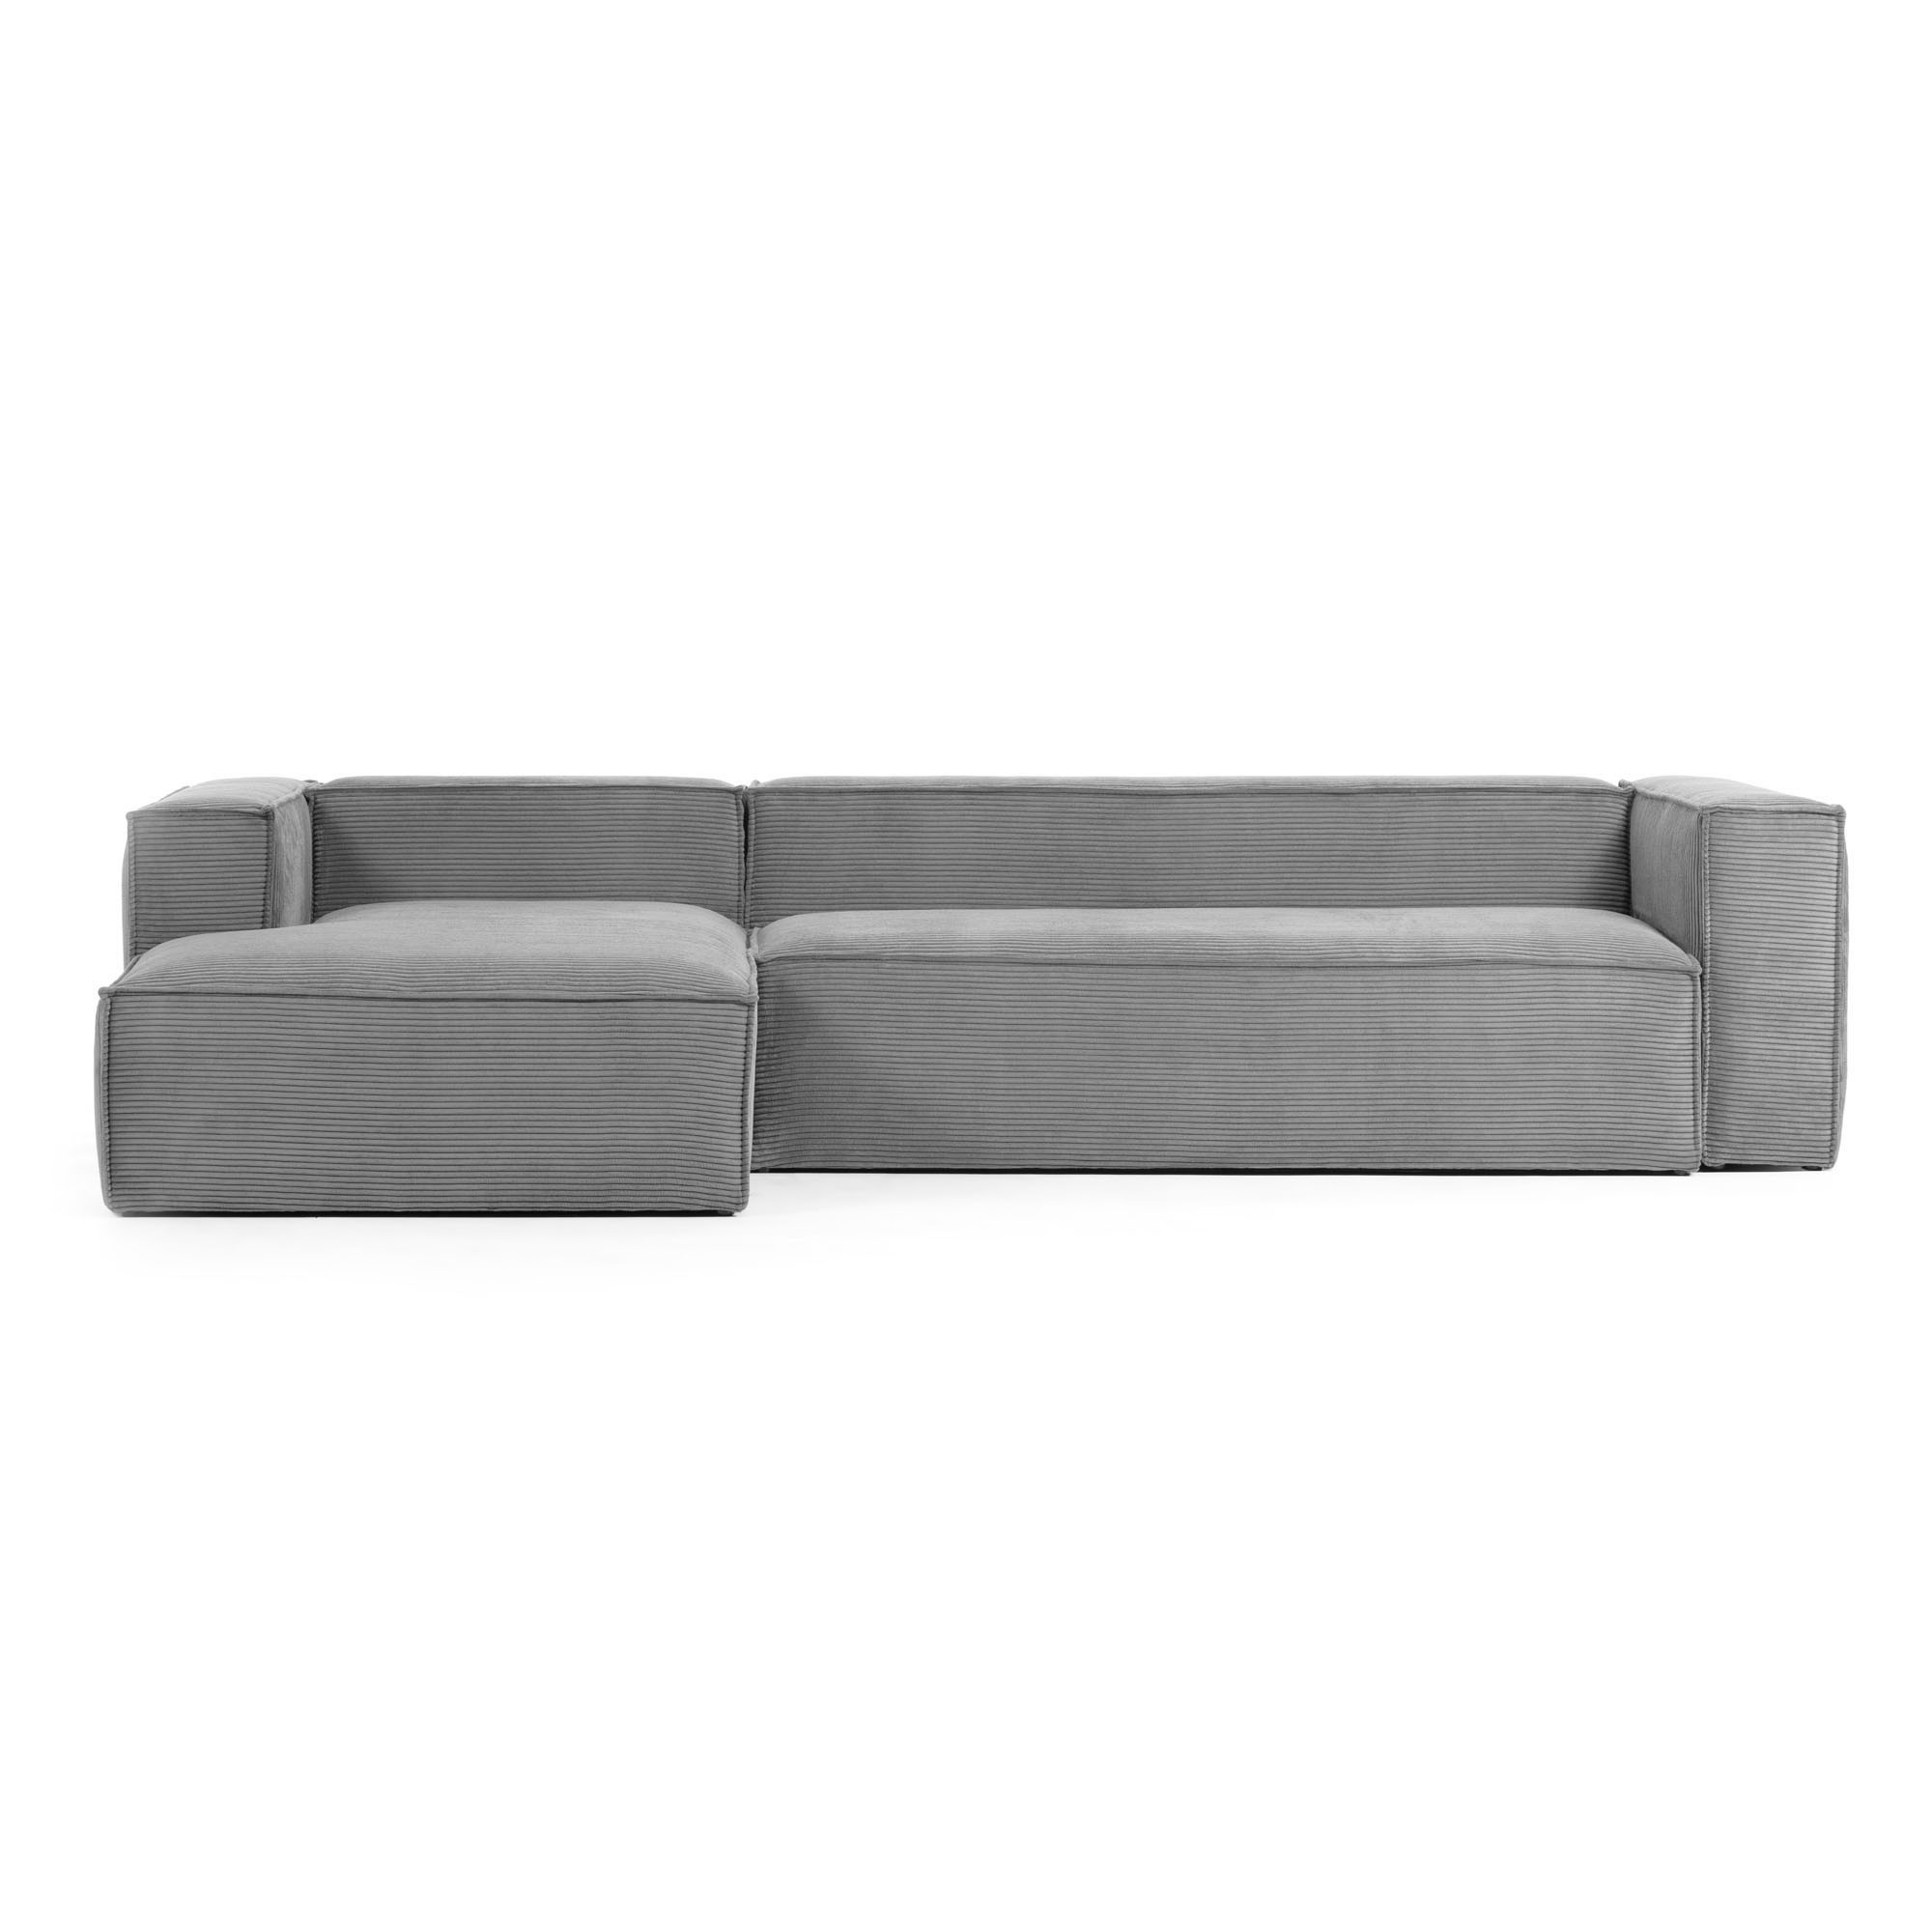 Lorton Corduroy Fabric Corner Sofa, 2 Seater with LHF Chaise, Grey